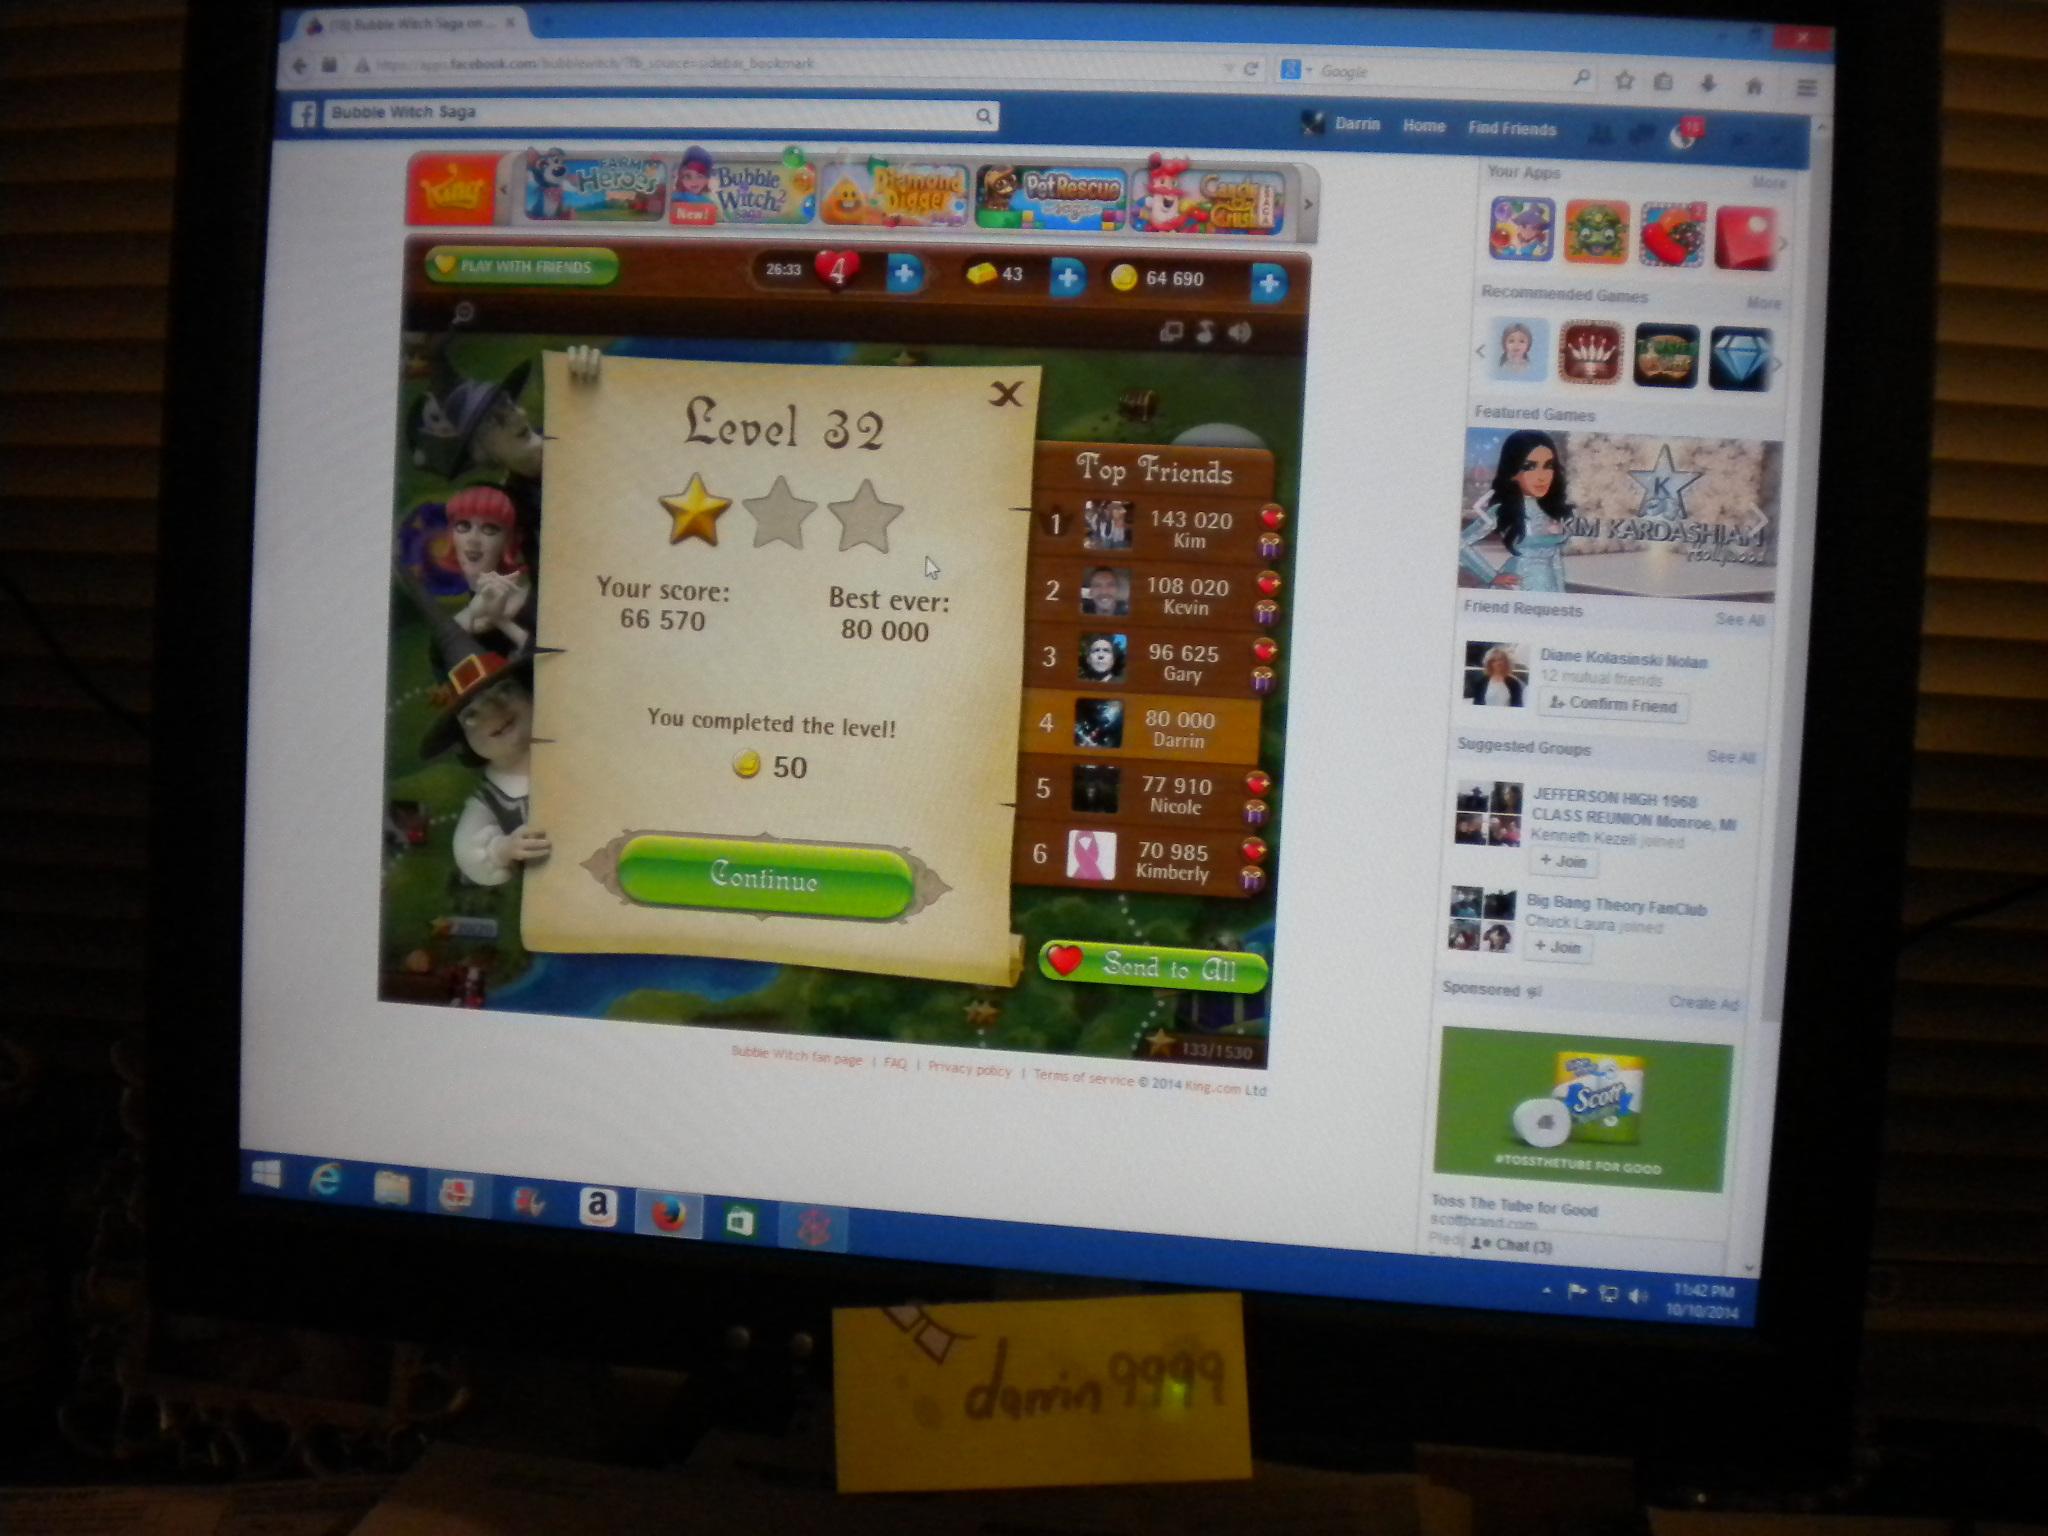 Bubble Witch Saga: Level 32 80,000 points